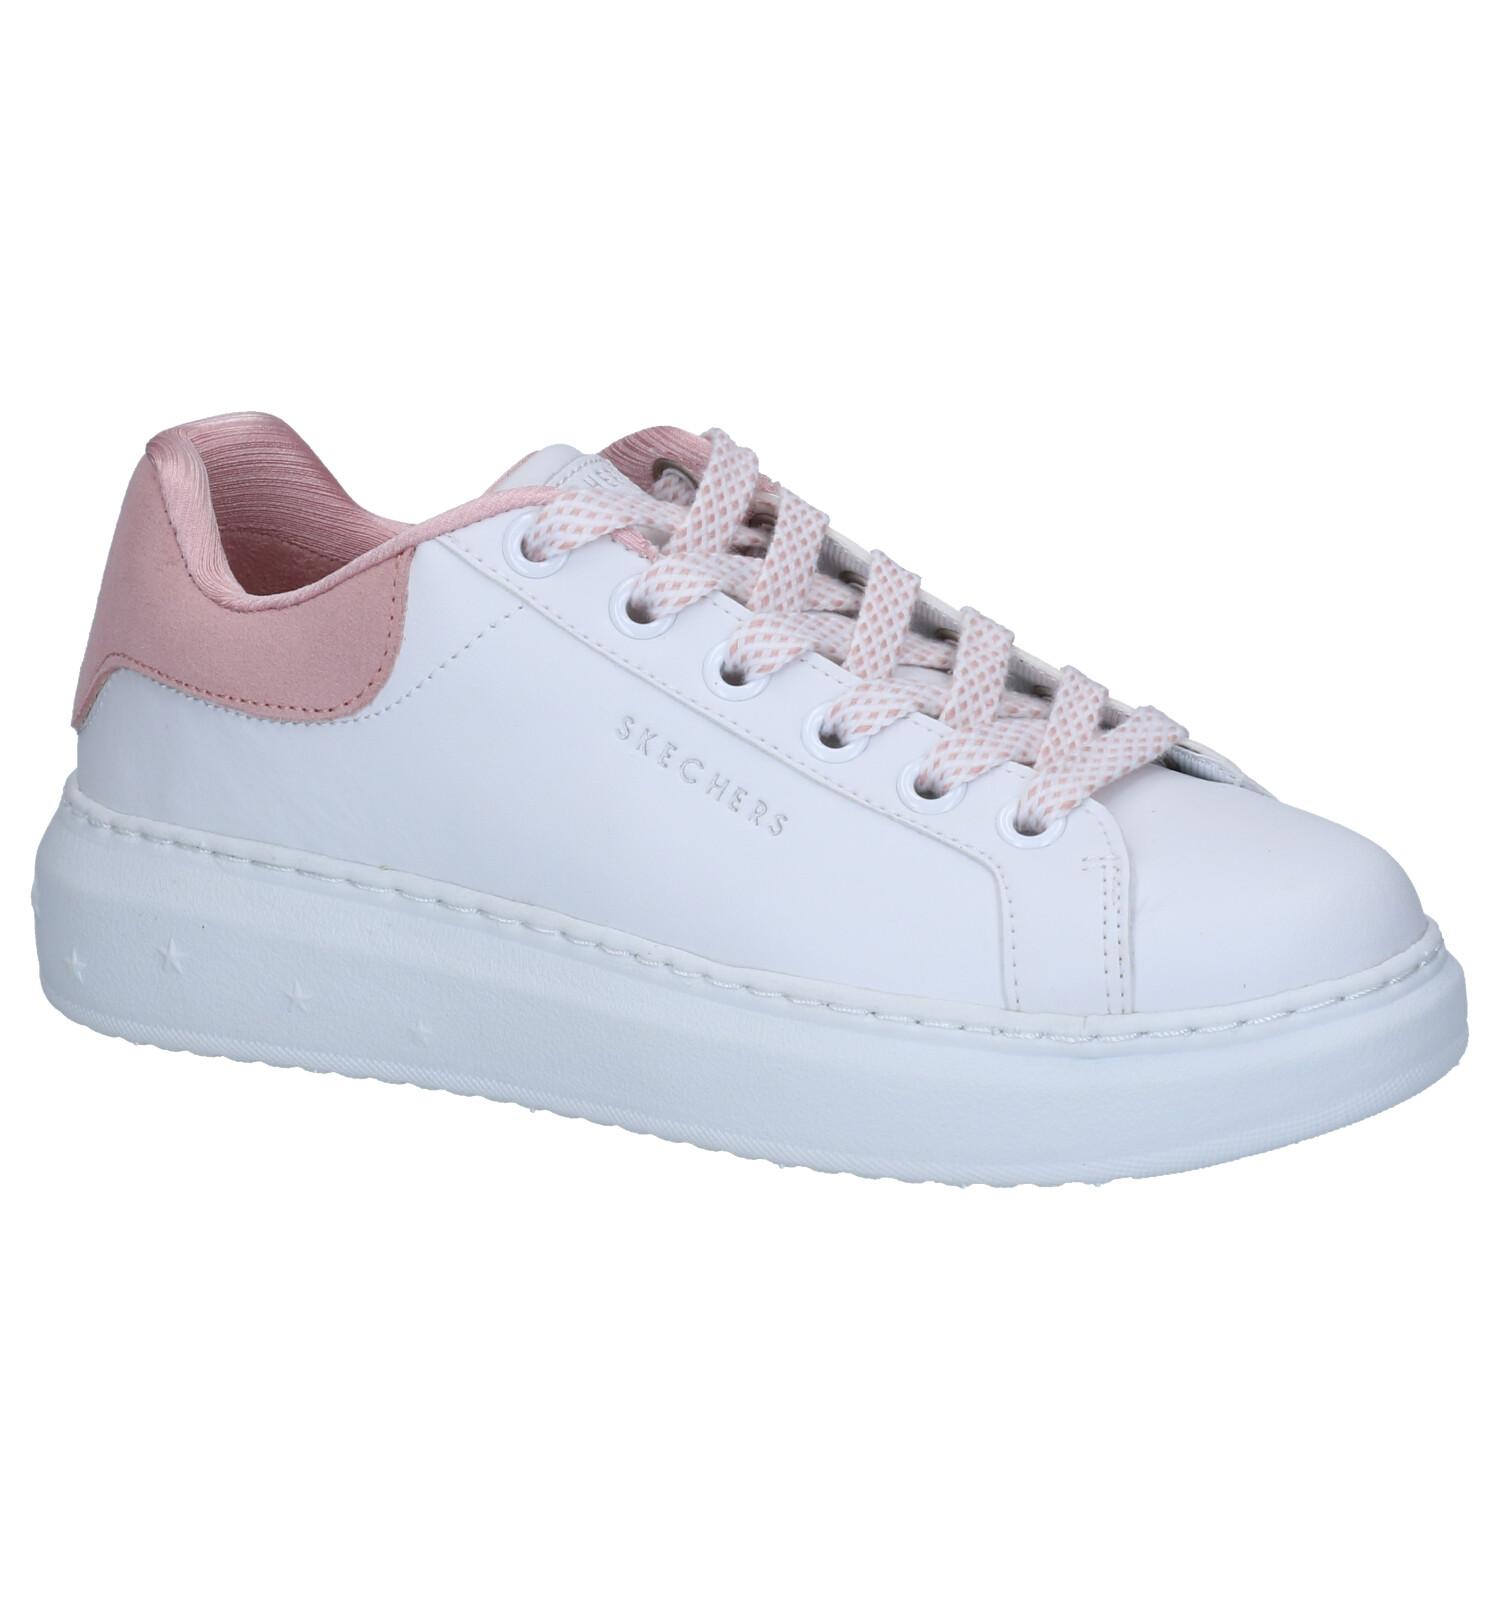 Skechers High Street Dotted Line Witte Sneakers   TORFS.BE   Gratis verzend en retour